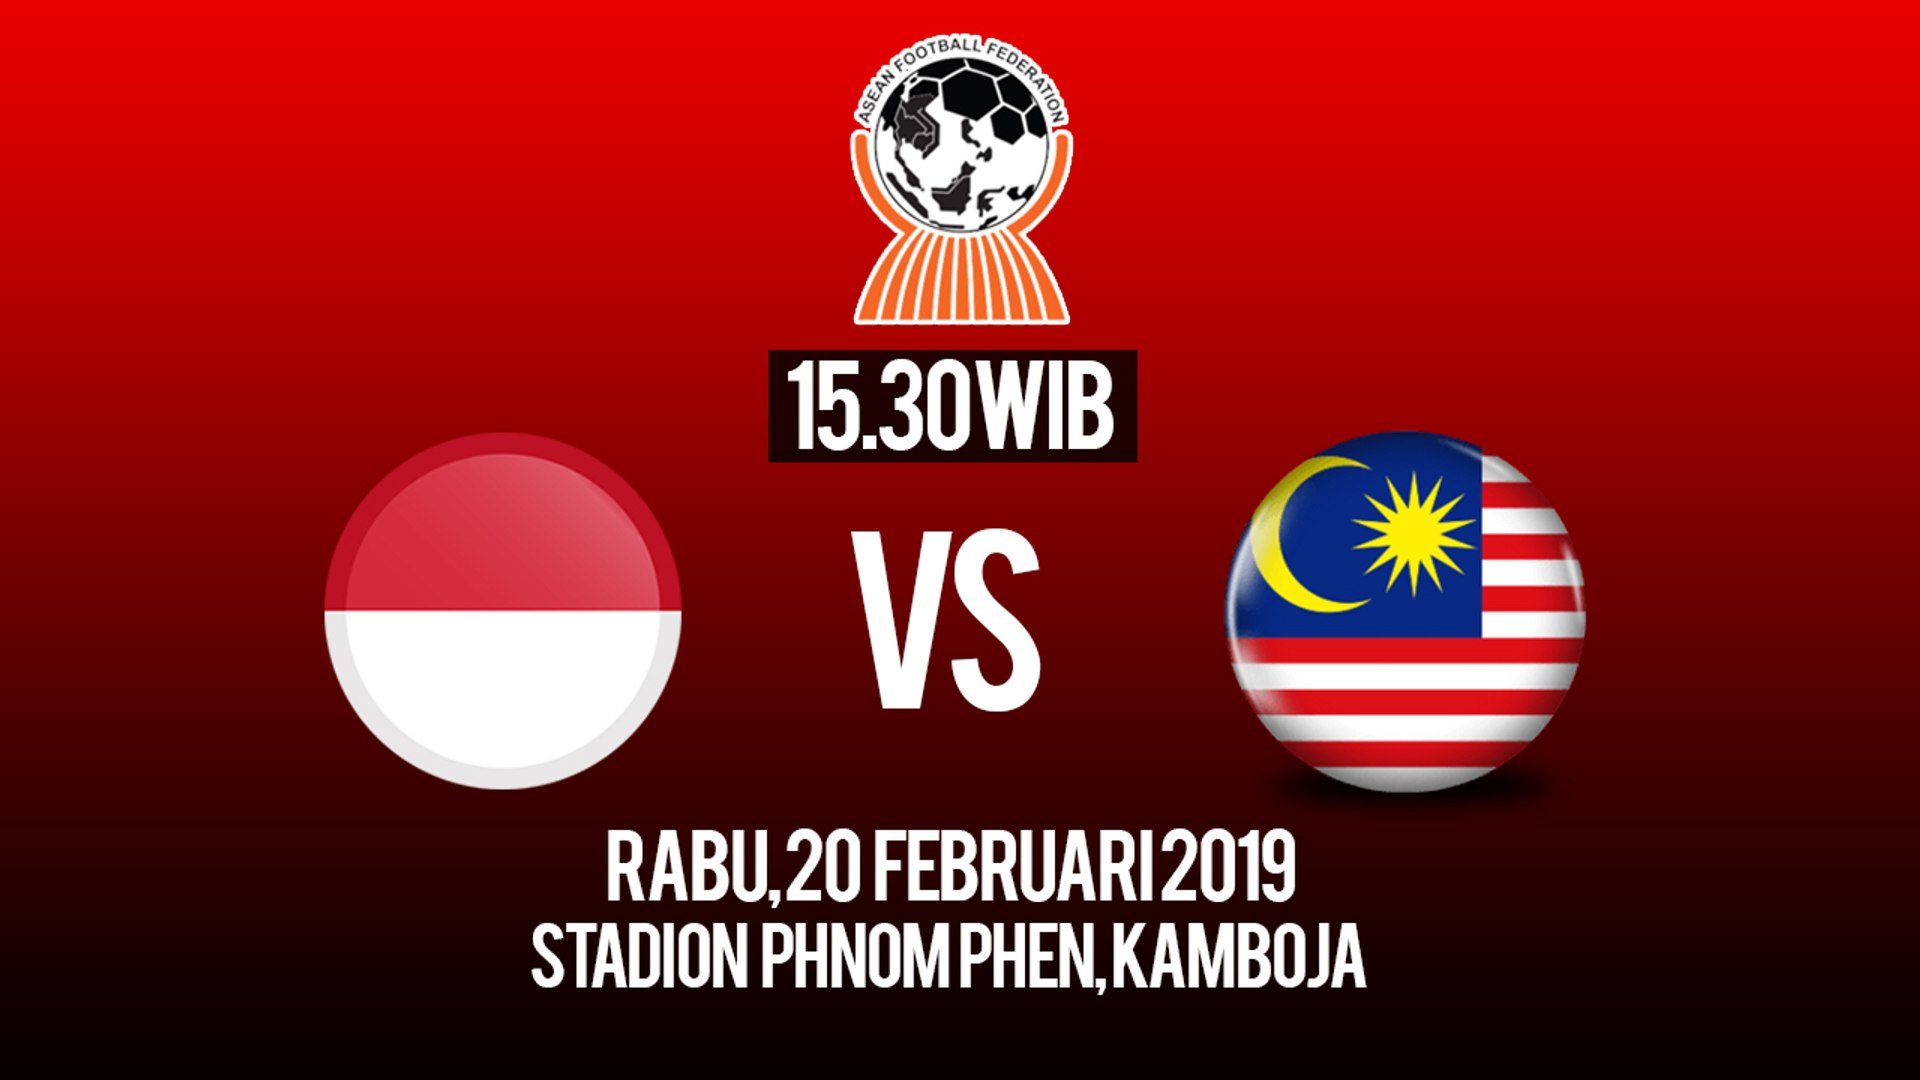 Jadwal Live Piala AFF U-22, Indonesia U-22 Vs Malaysia U-22, Rabu Pukul 15.30 WIB